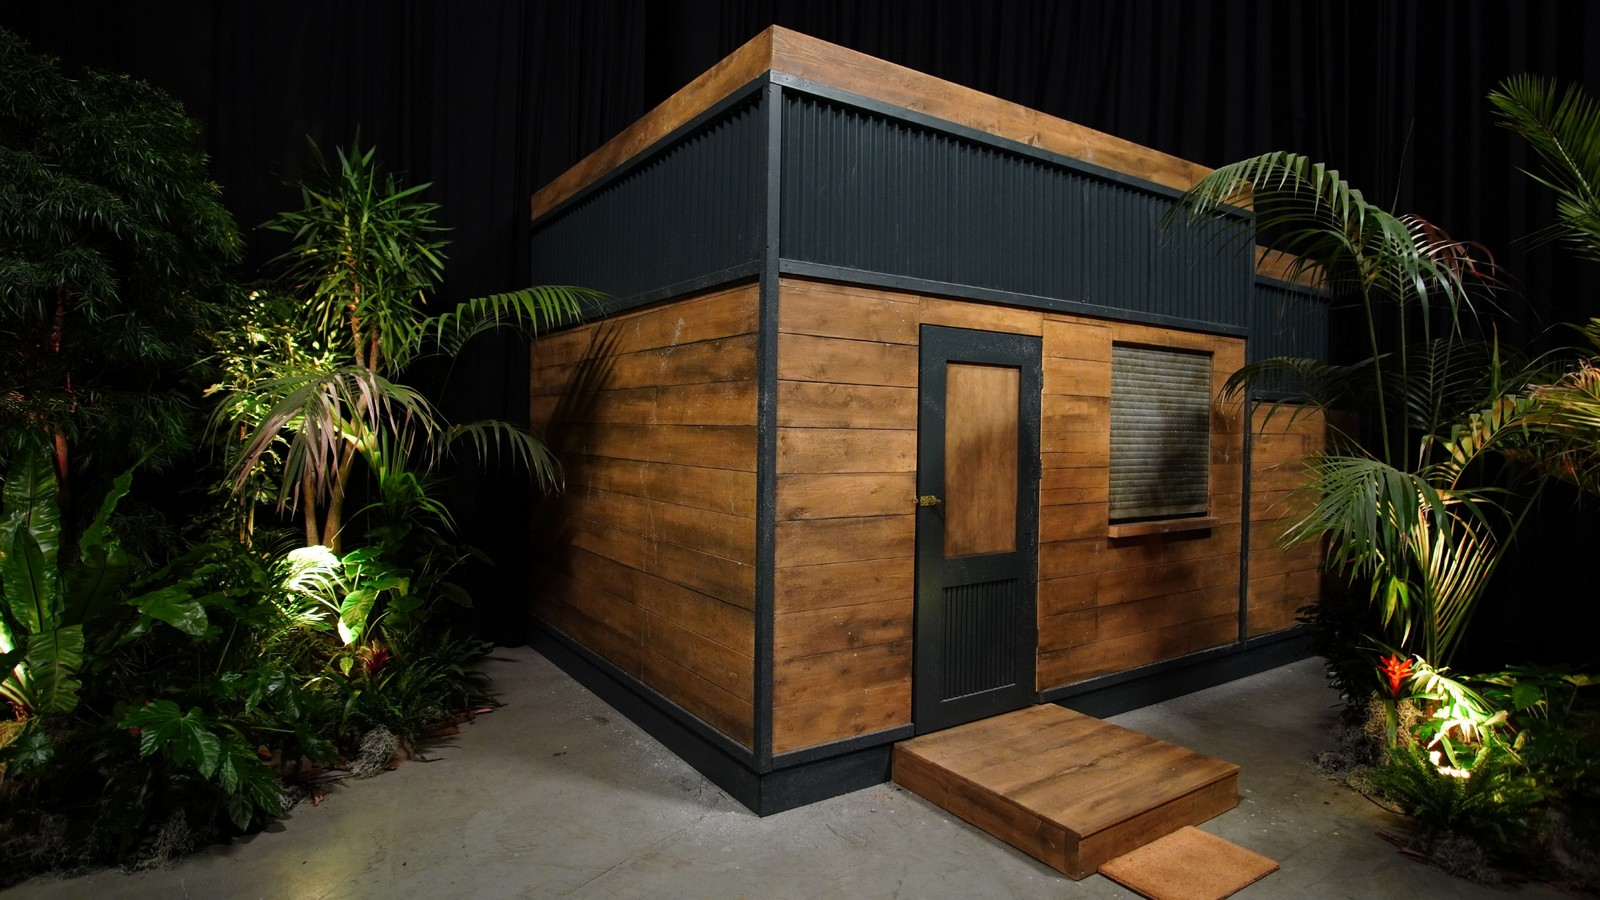 Tiny House in der Dschungelshow